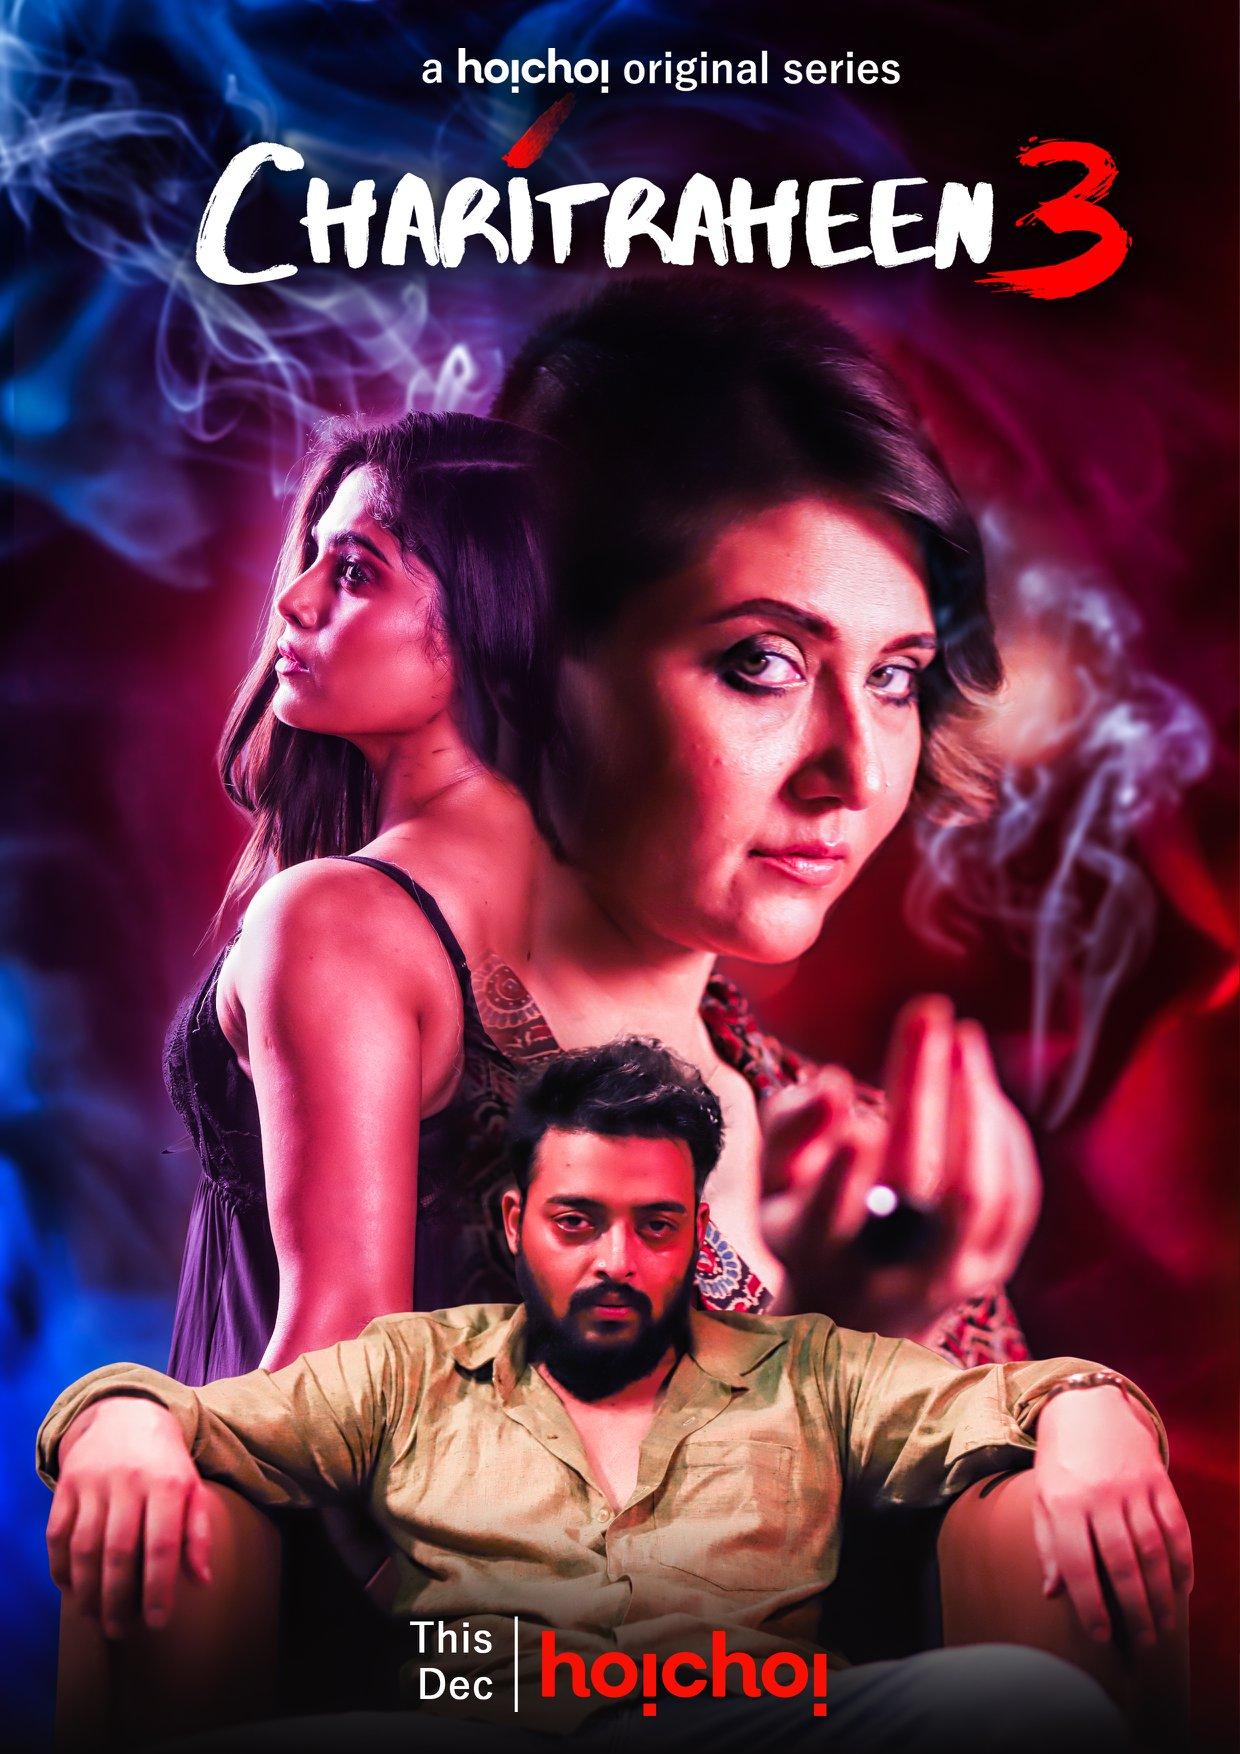 Charitraheen 2020 S03 Bengali Hoichoi Original Web Series Official Trailer 1080p HDRip Download